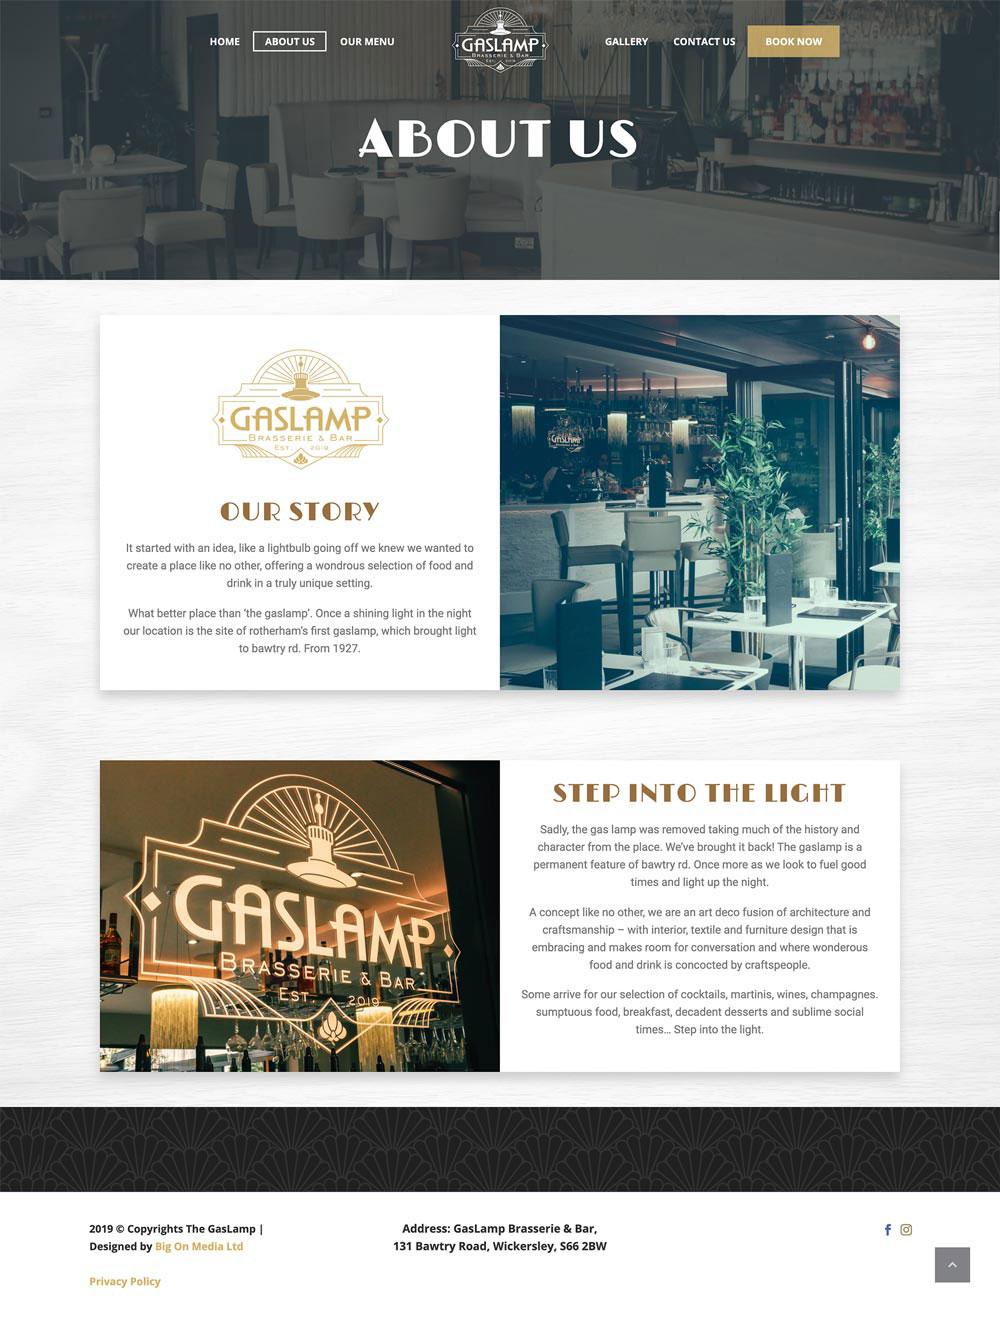 GasLamp Brasserie Bar Wickersley Idea Design Creative Design Studio Photography Rotherham Sheffield About Before